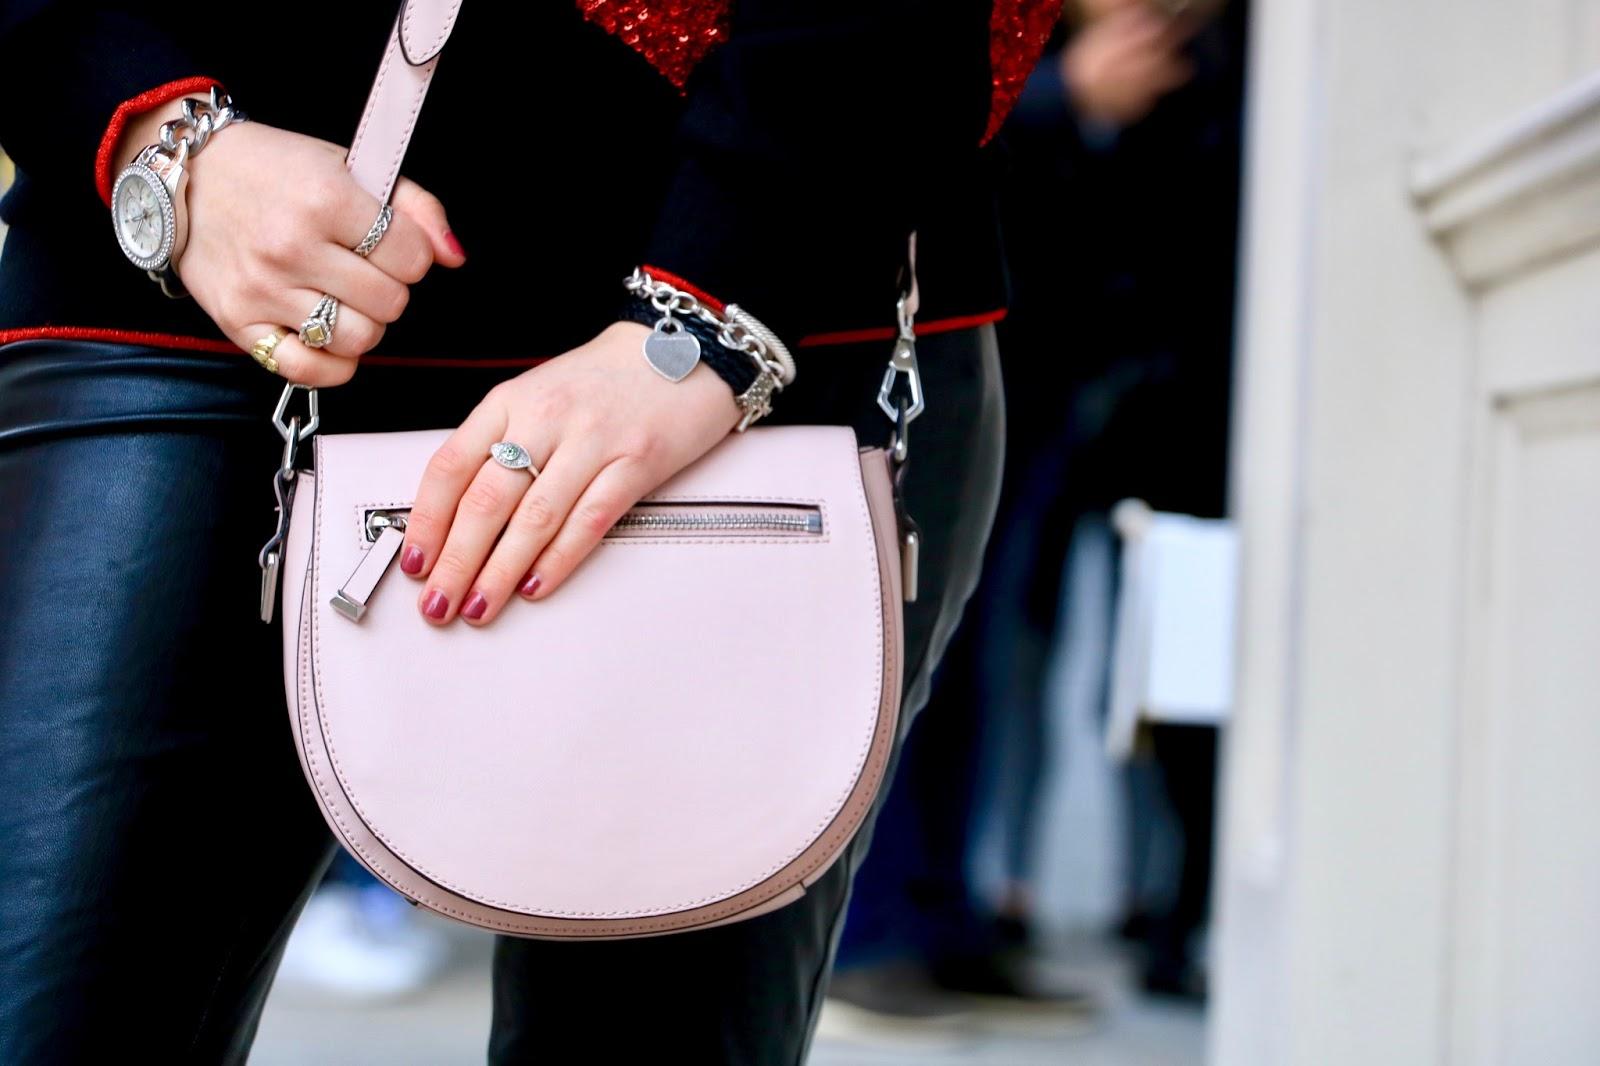 Nyc fashion blogger Kathleen Harper wearing a pink Rebecca Minkoff purse